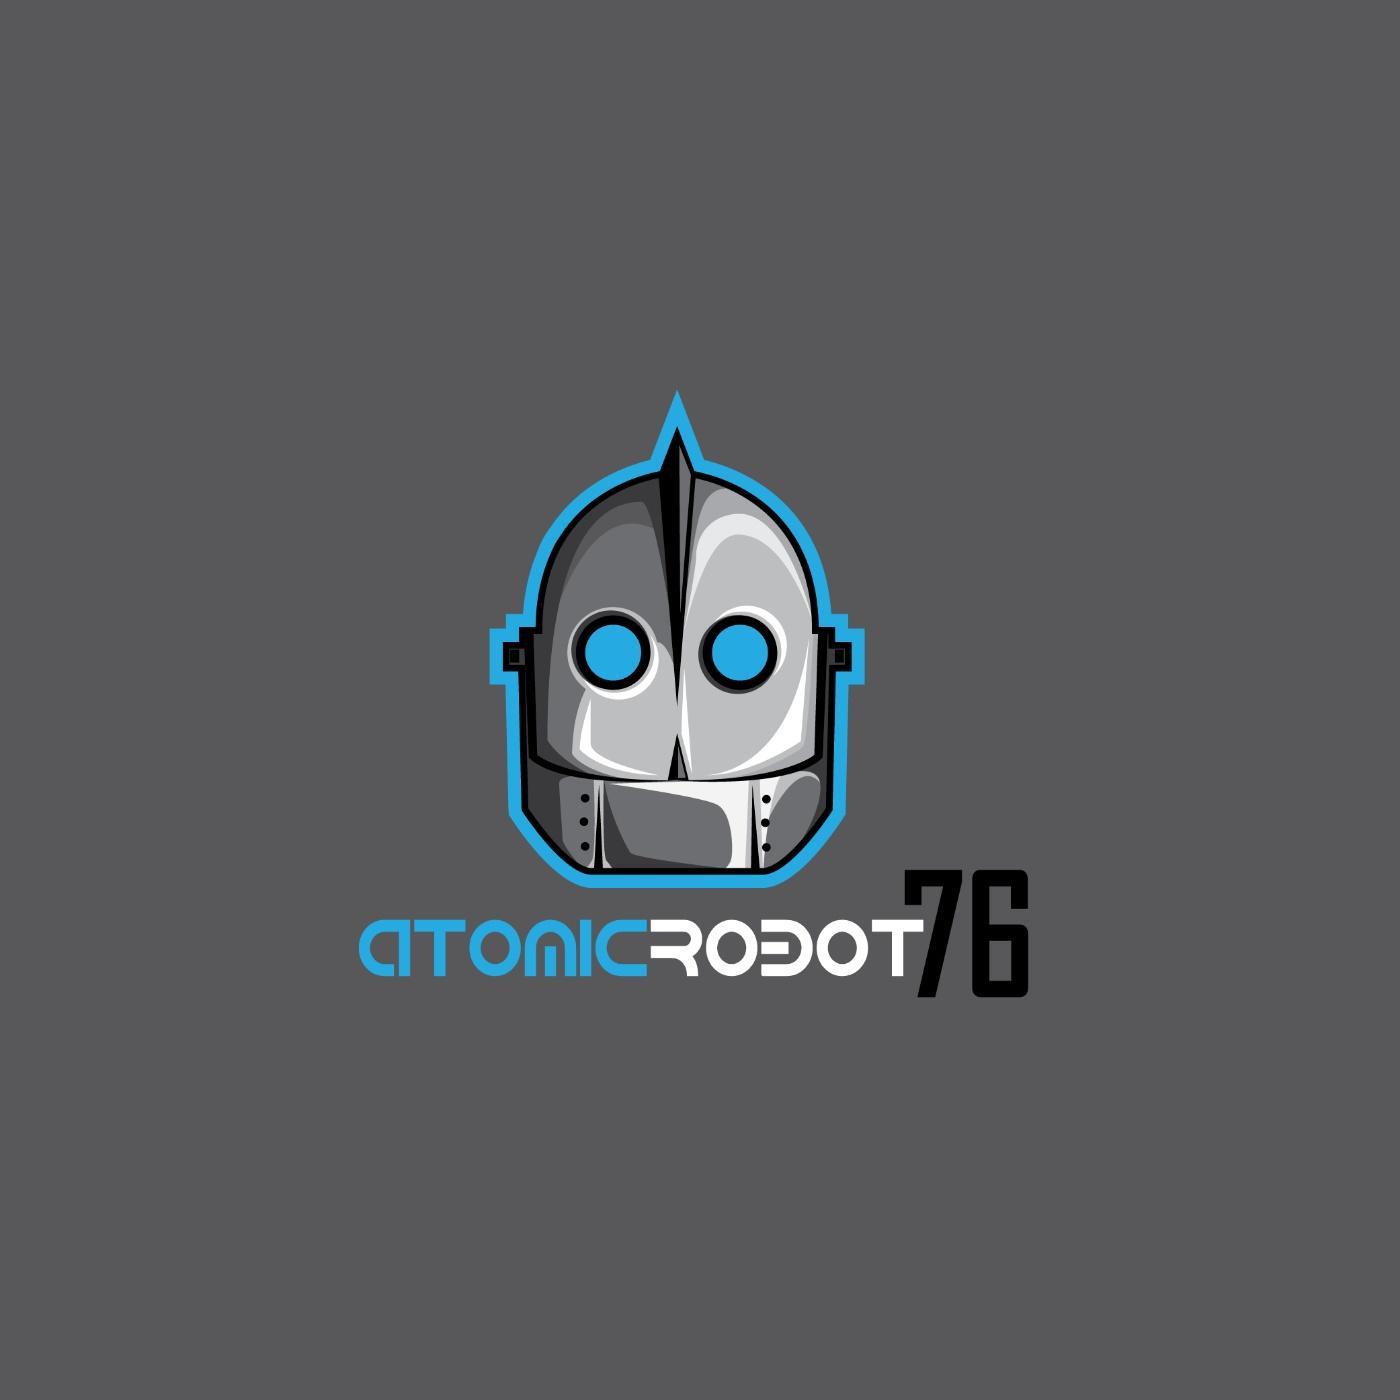 Twitch Streamer Logo - AtomicRobot76